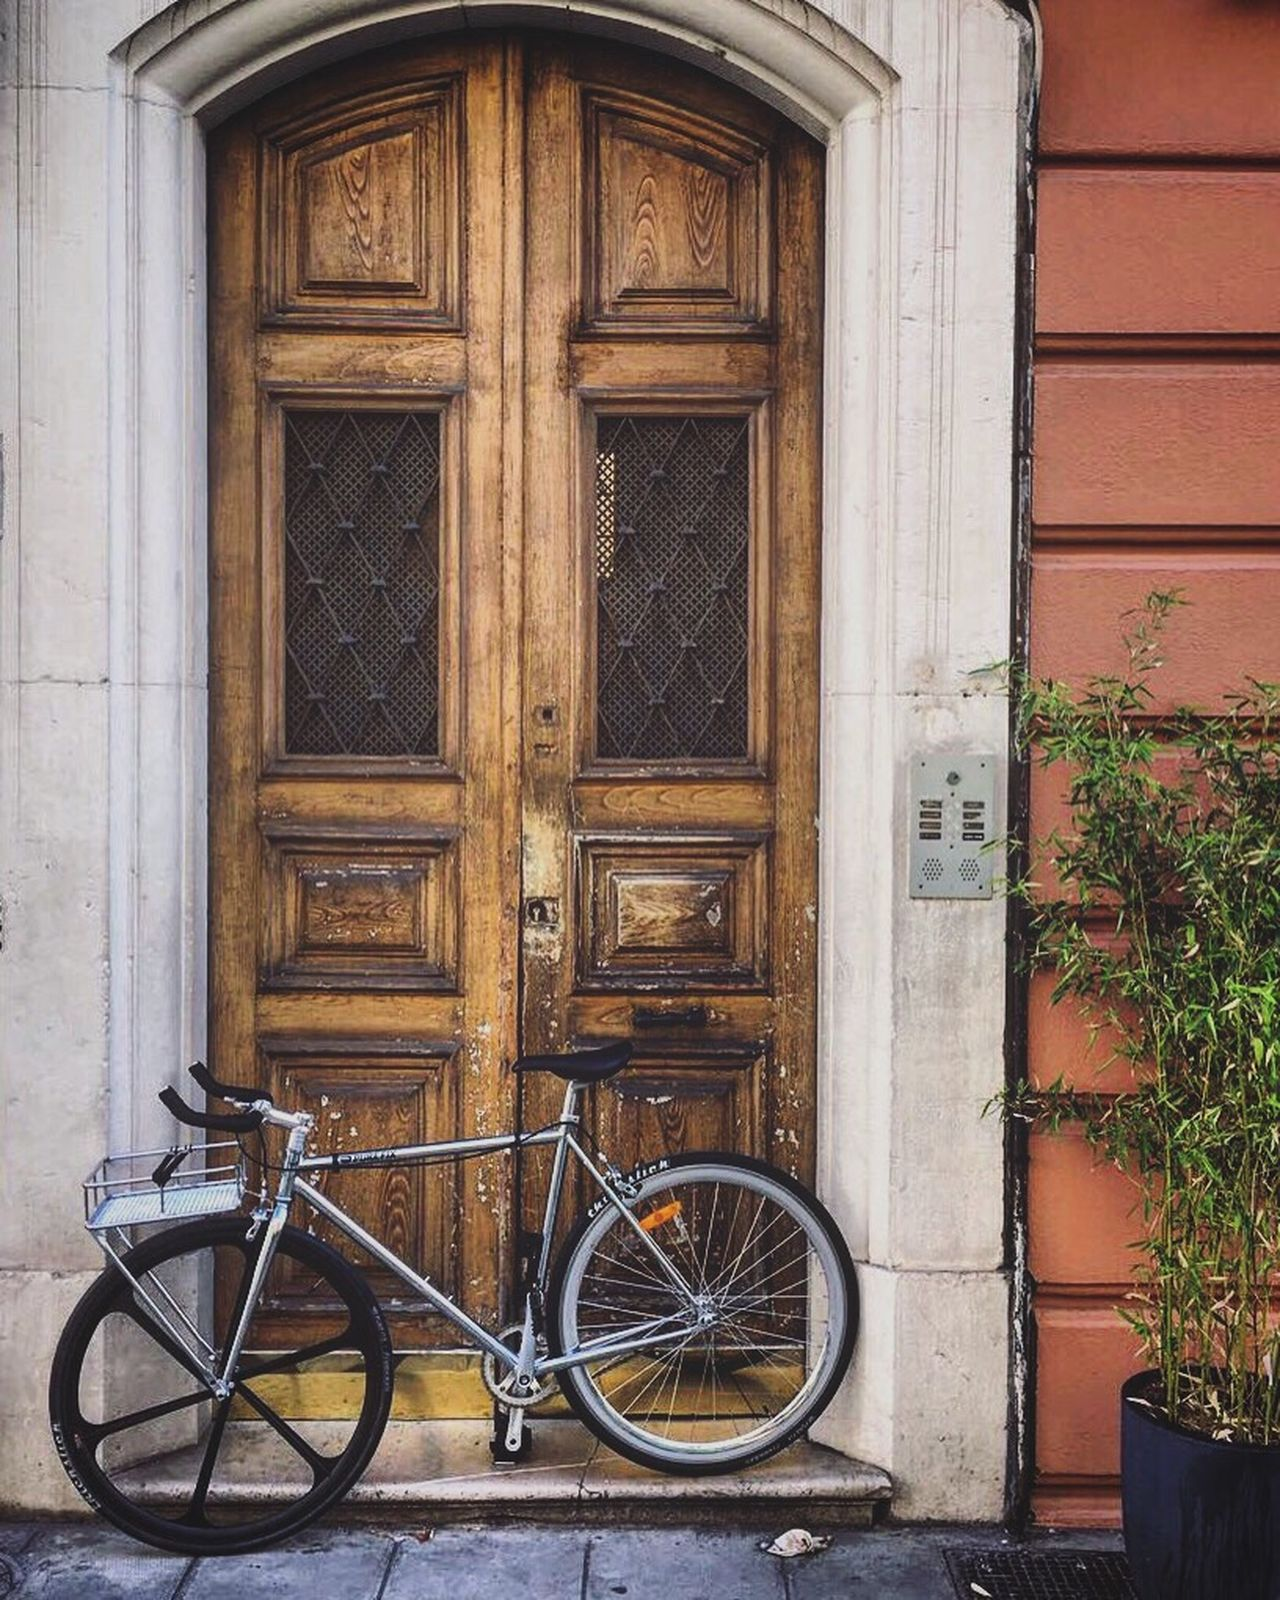 Singlespeed Fixie Bicycle Bike Door Wood Côte D'Azur France Nice Streetphotography